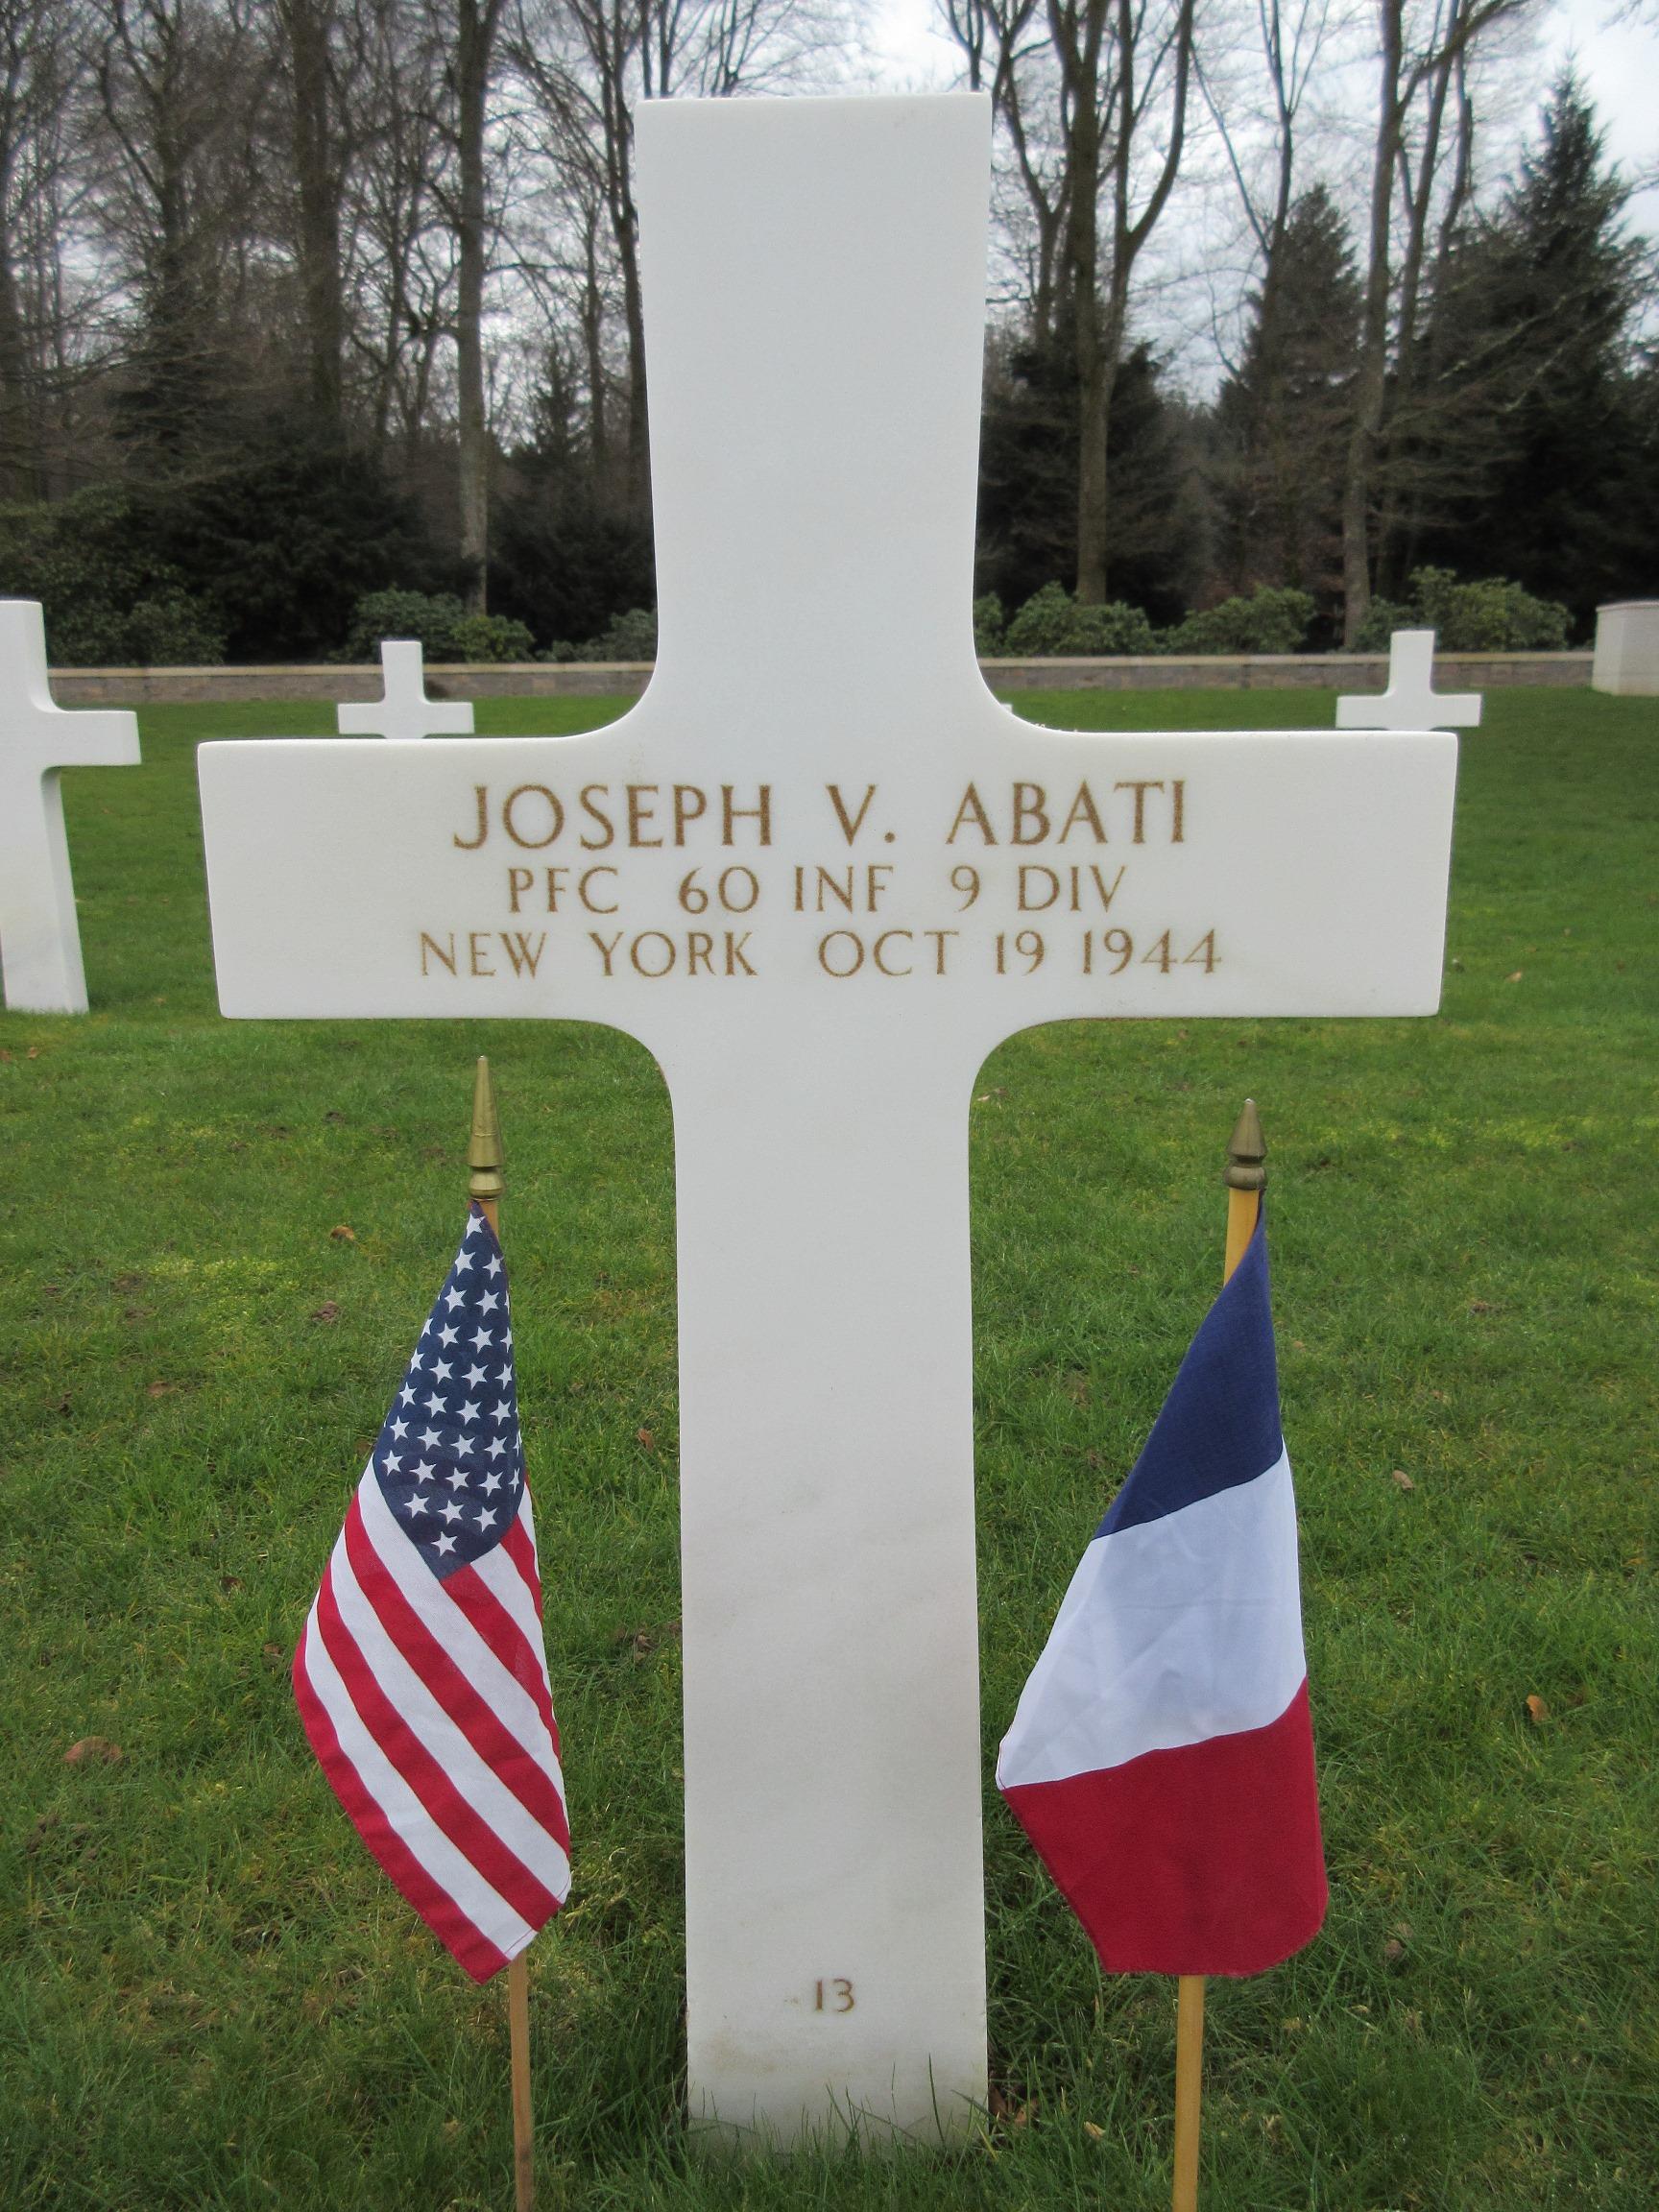 PFC Joseph V Abati